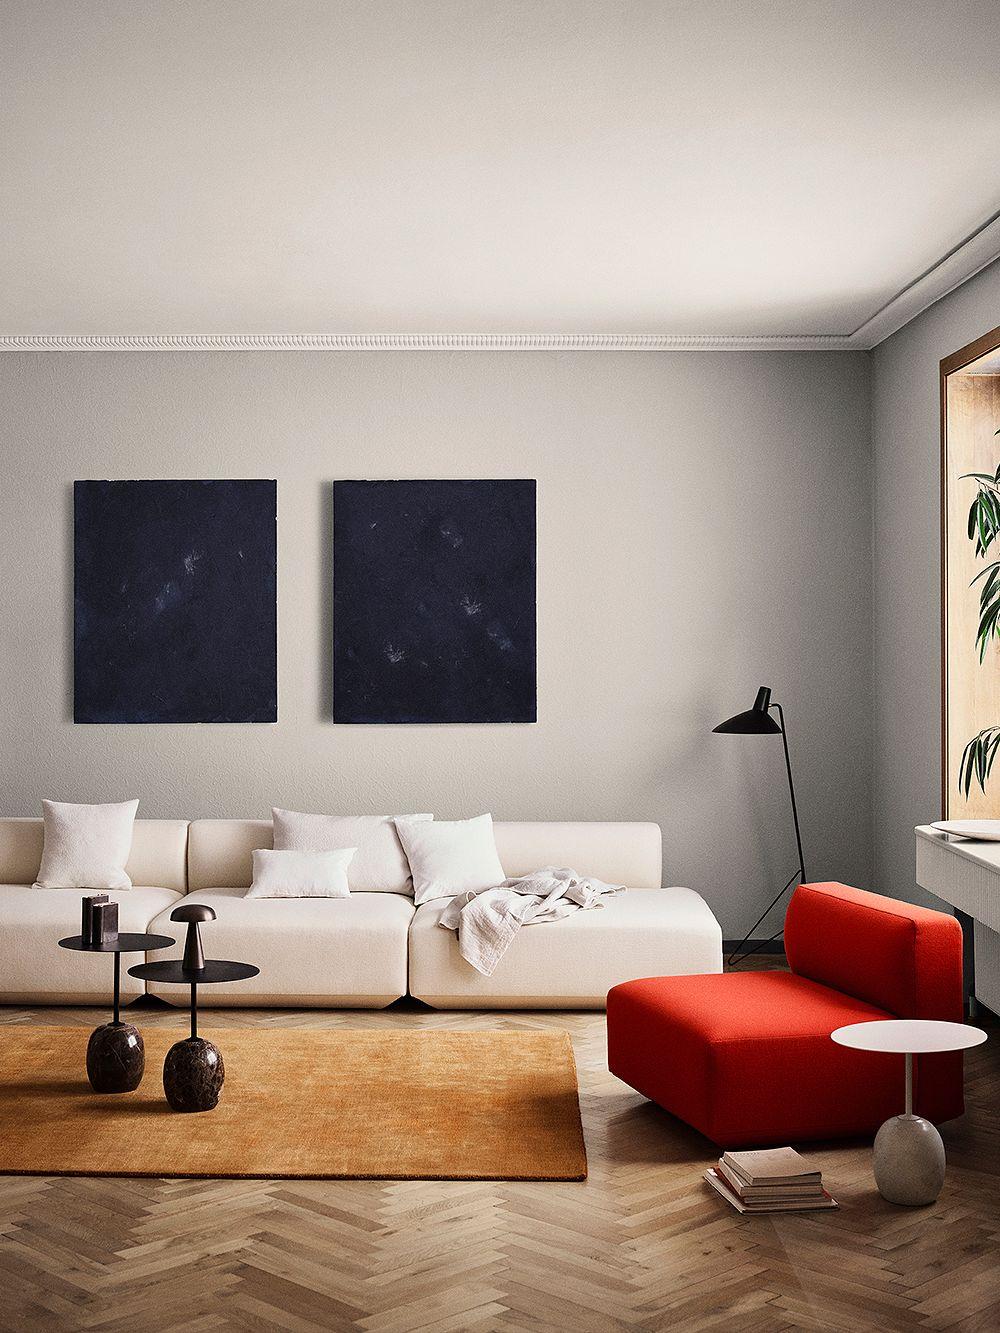 &Tradition Develius sofa, Lato coffee table and Tripod floor light